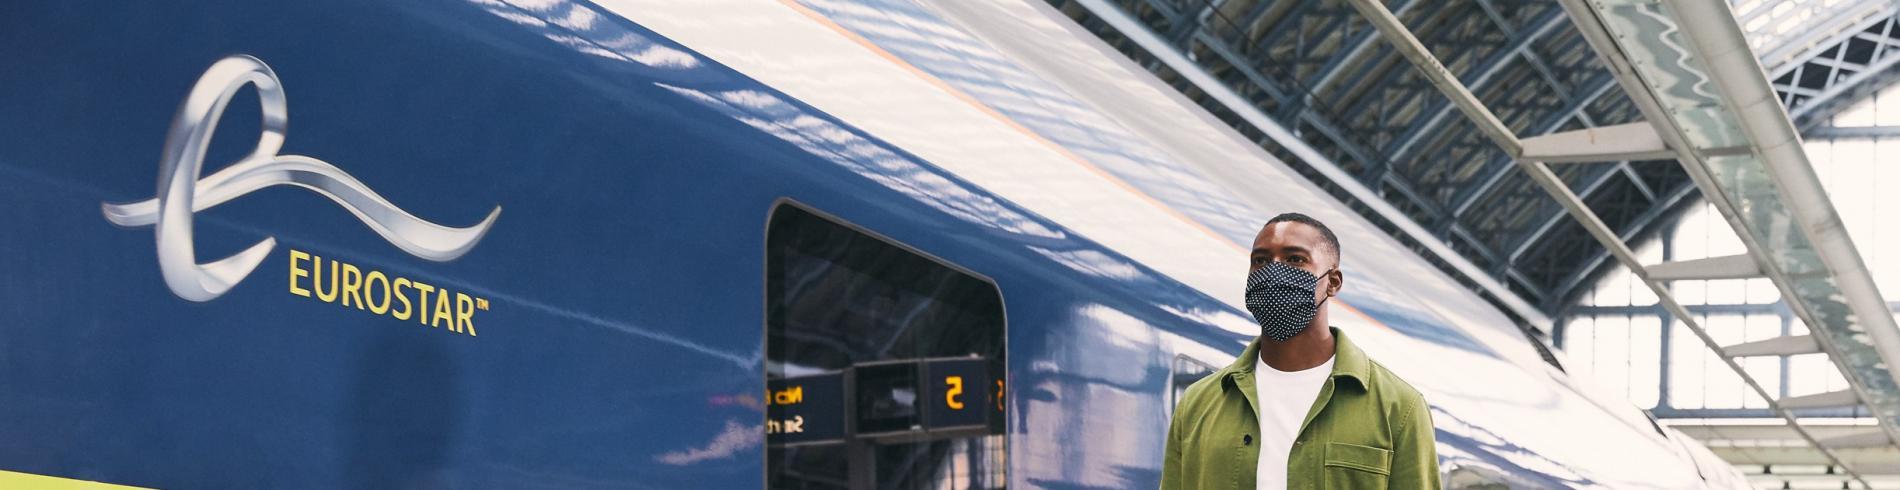 Man in mask getting on the Eurostar train